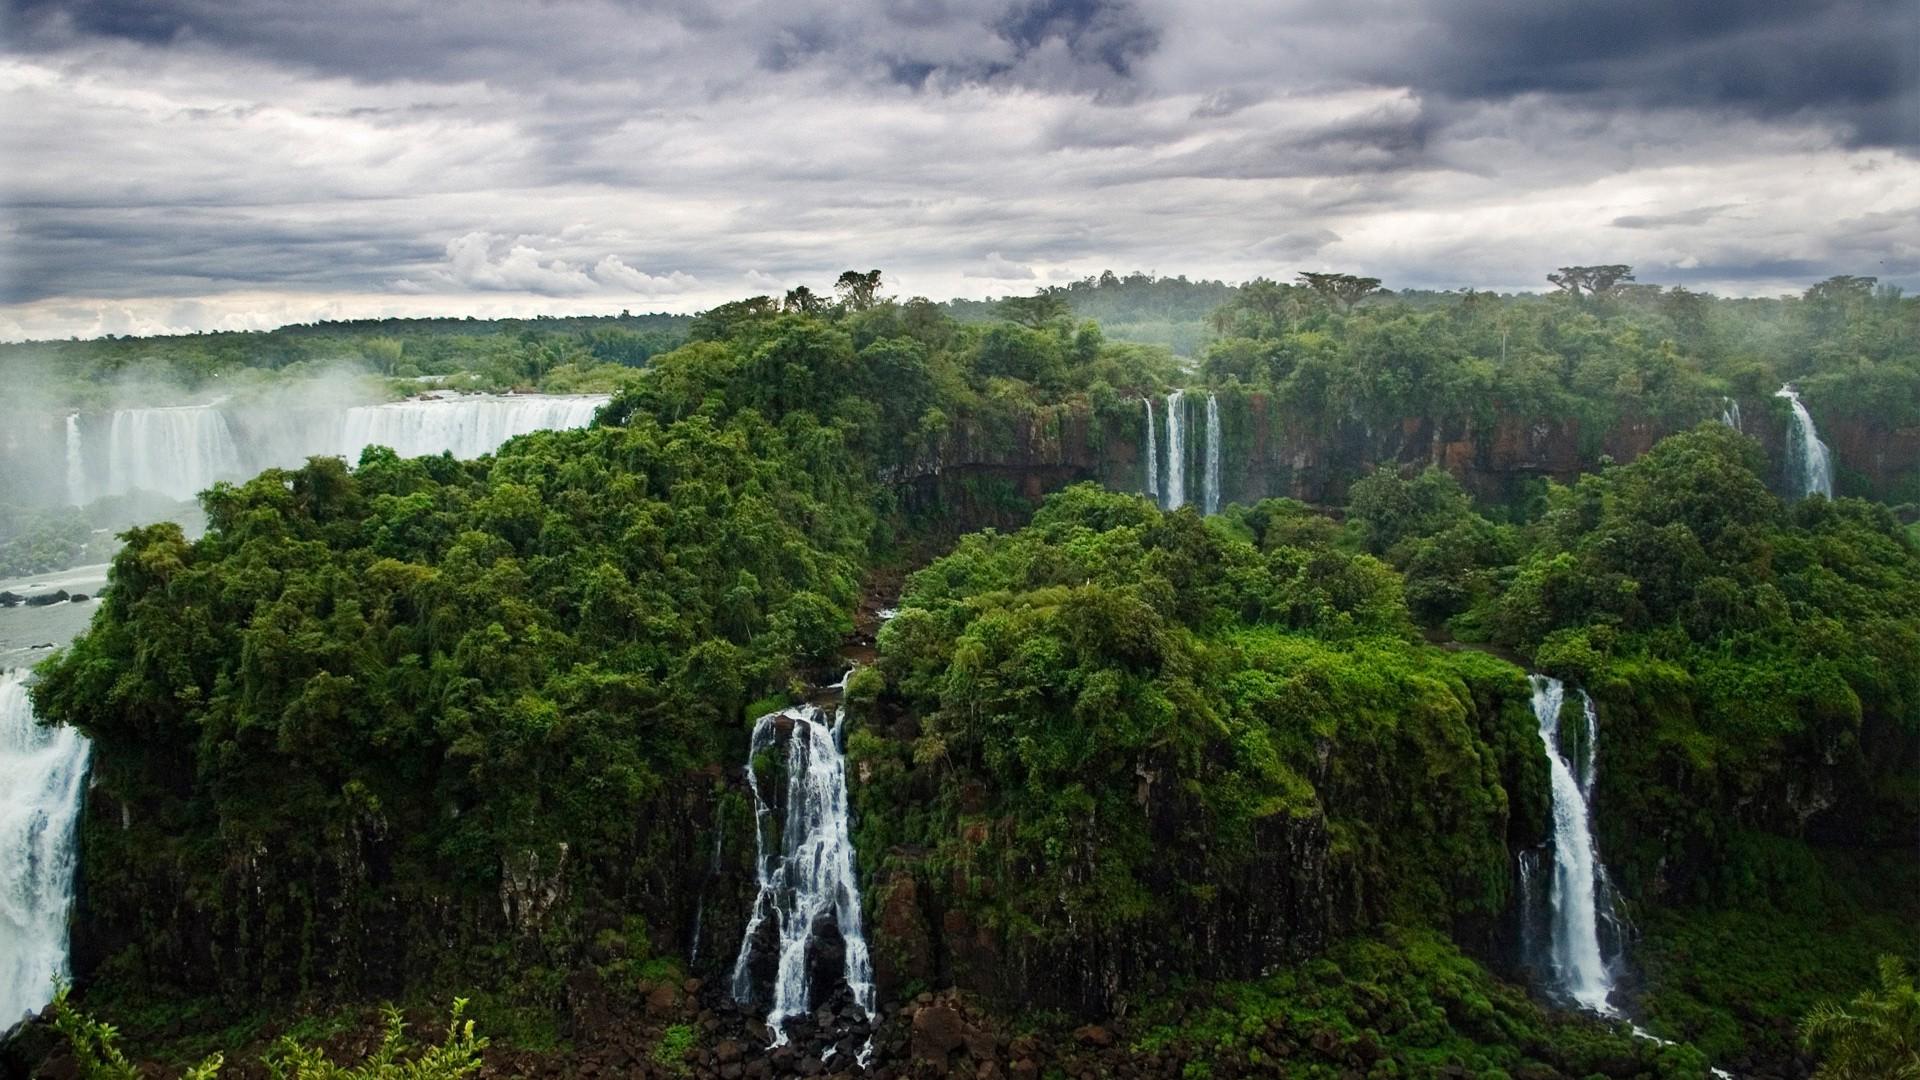 Iguazu Falls Brazil Wallpaper Nature Landscape Waterfall Forest Tropical Forest